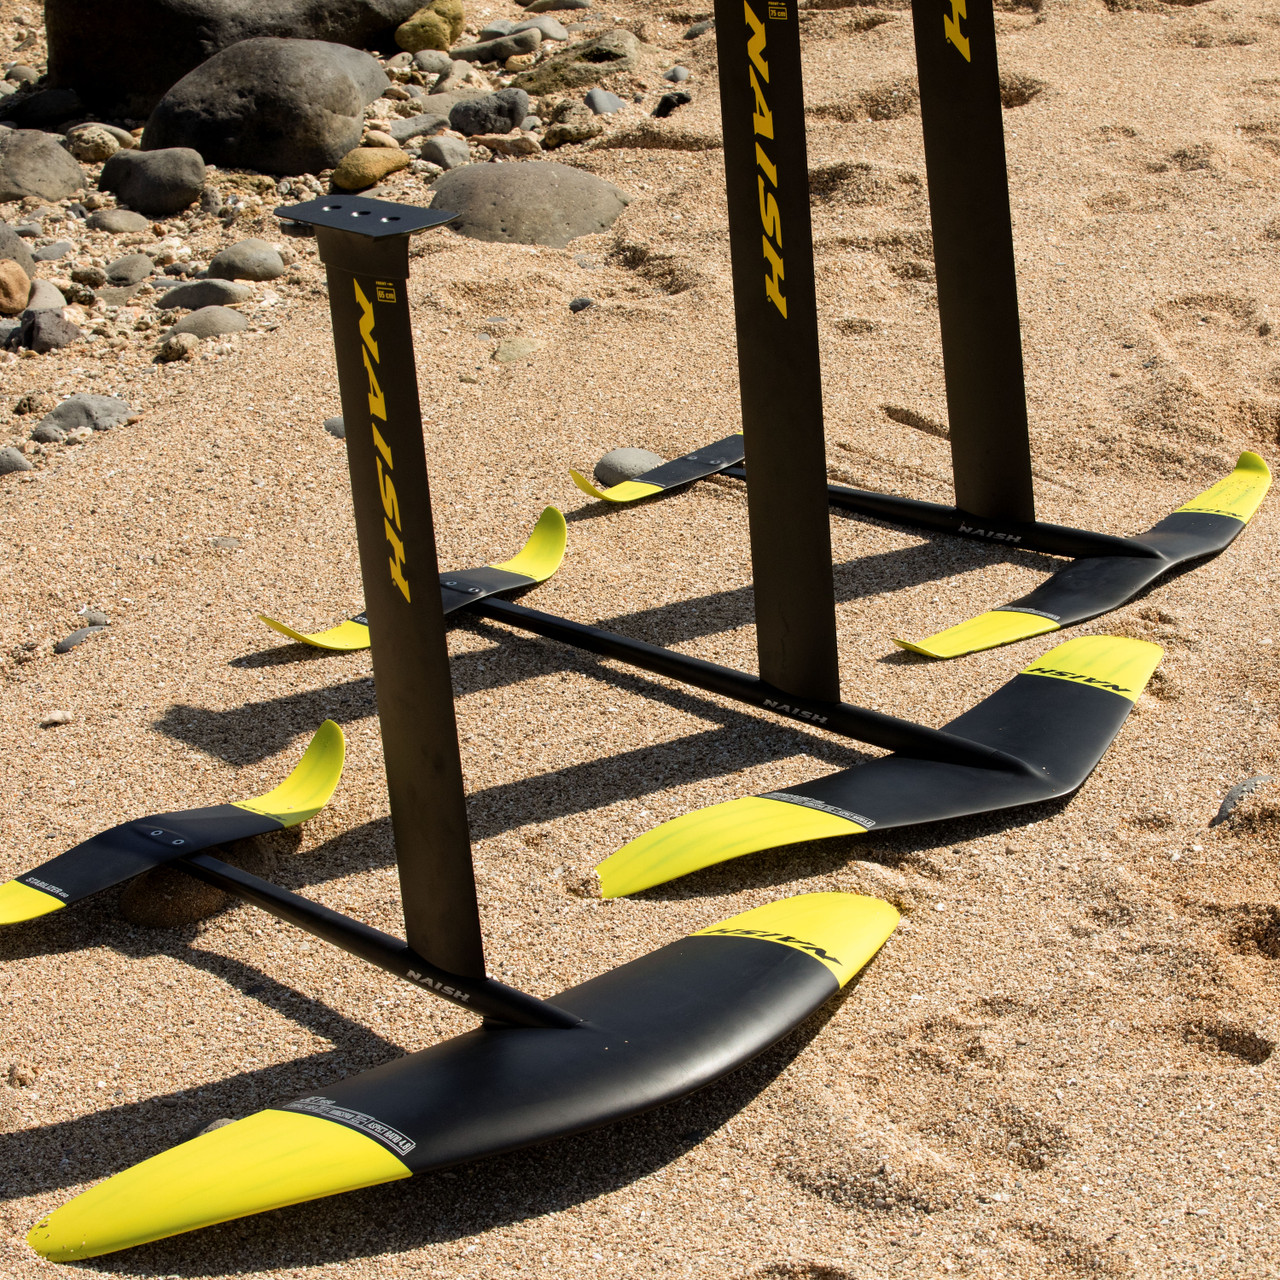 2020 Naish Windsurf 1150 Foil Complete Abracadabra